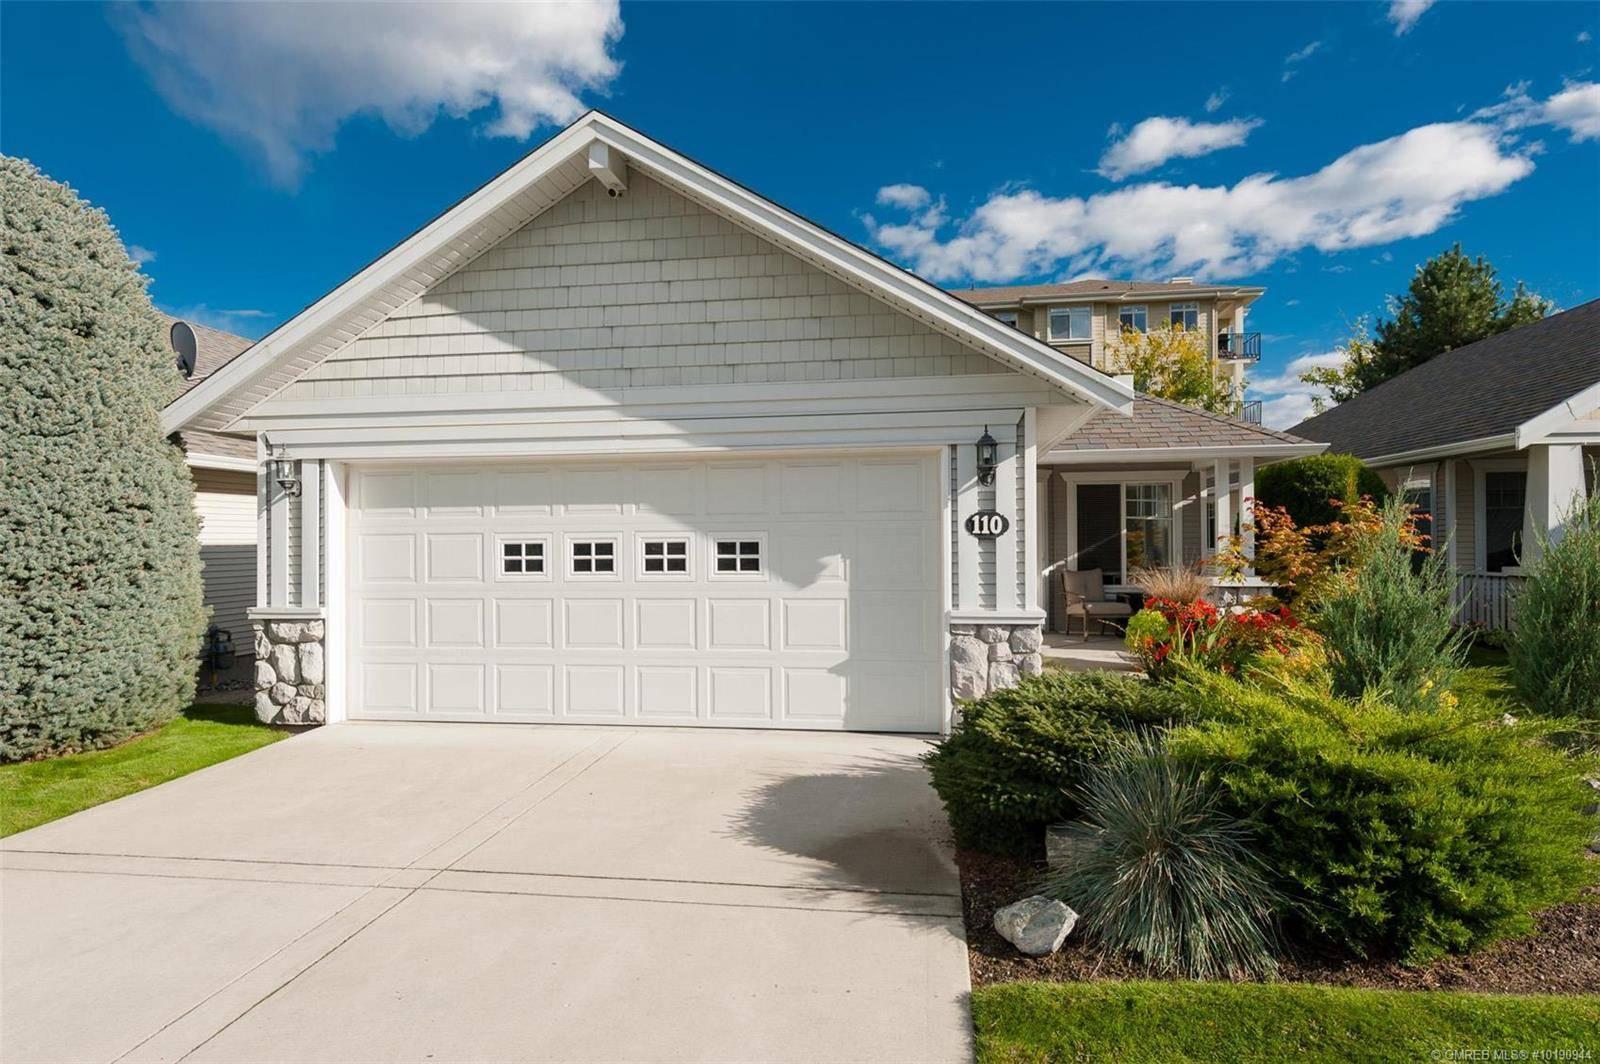 Townhouse for sale at 1330 Ridgeway Dr Unit 110 Kelowna British Columbia - MLS: 10190944